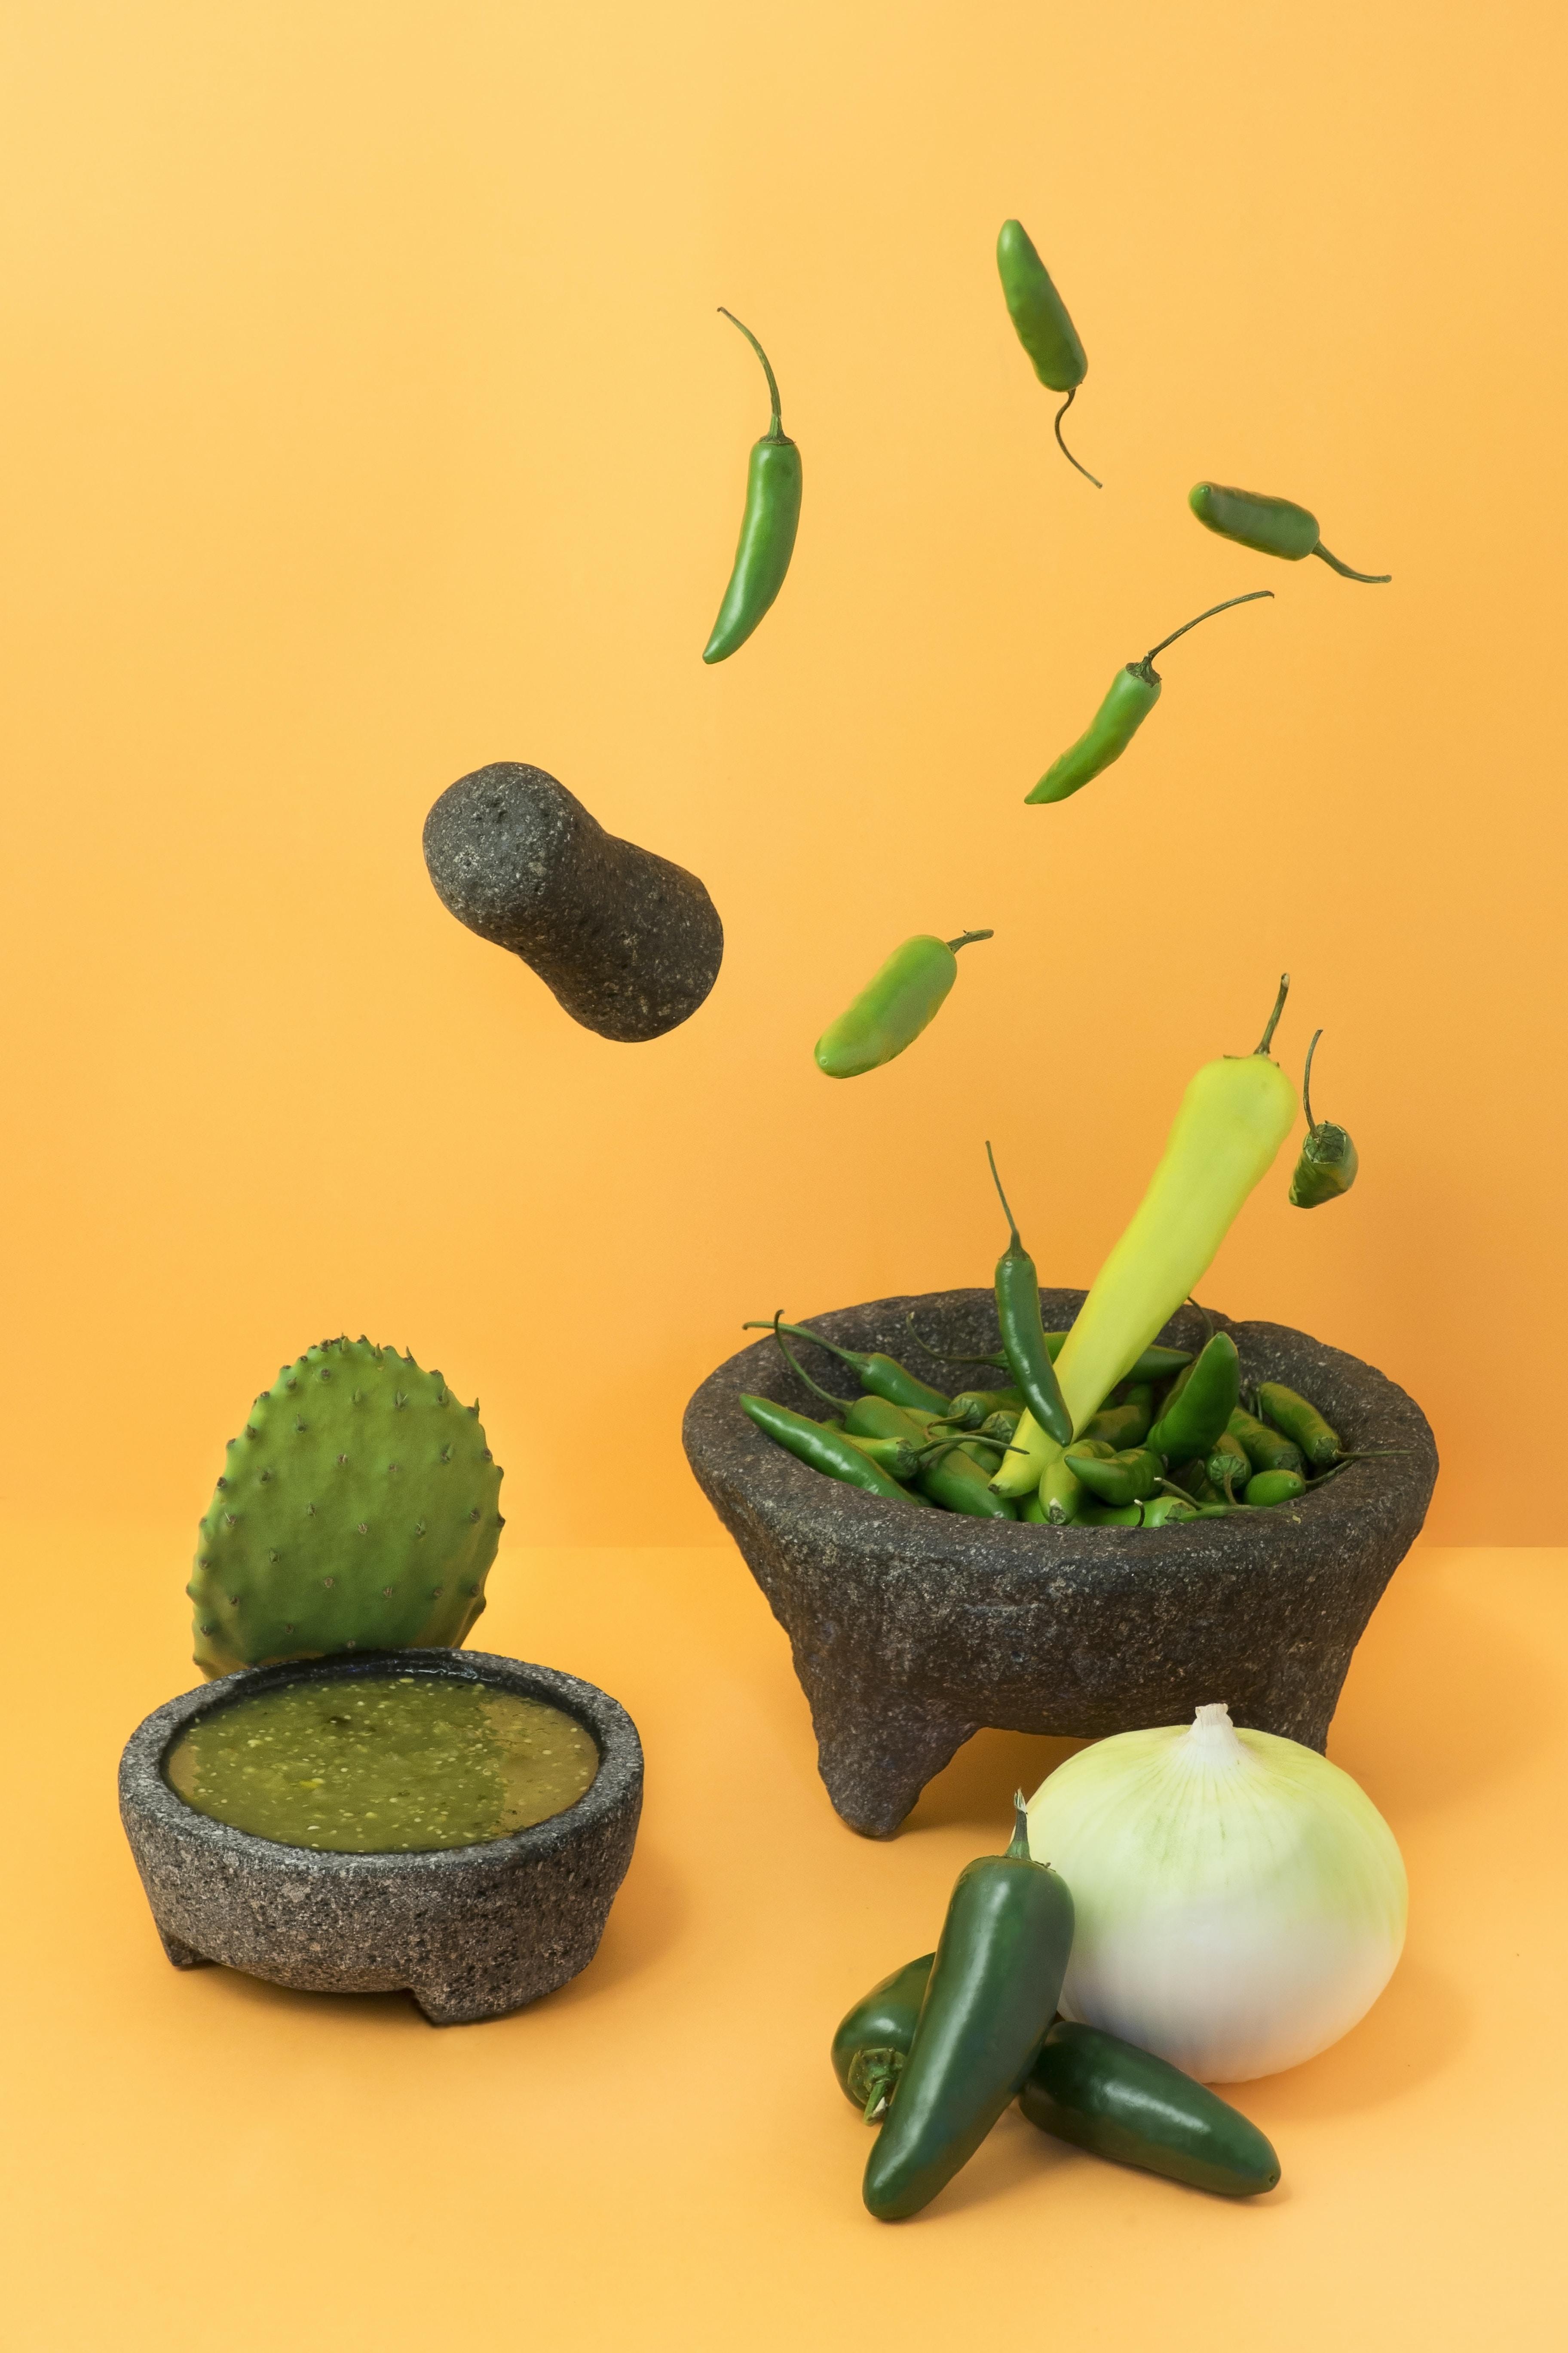 Various vegetables on an orangish yellow surface.